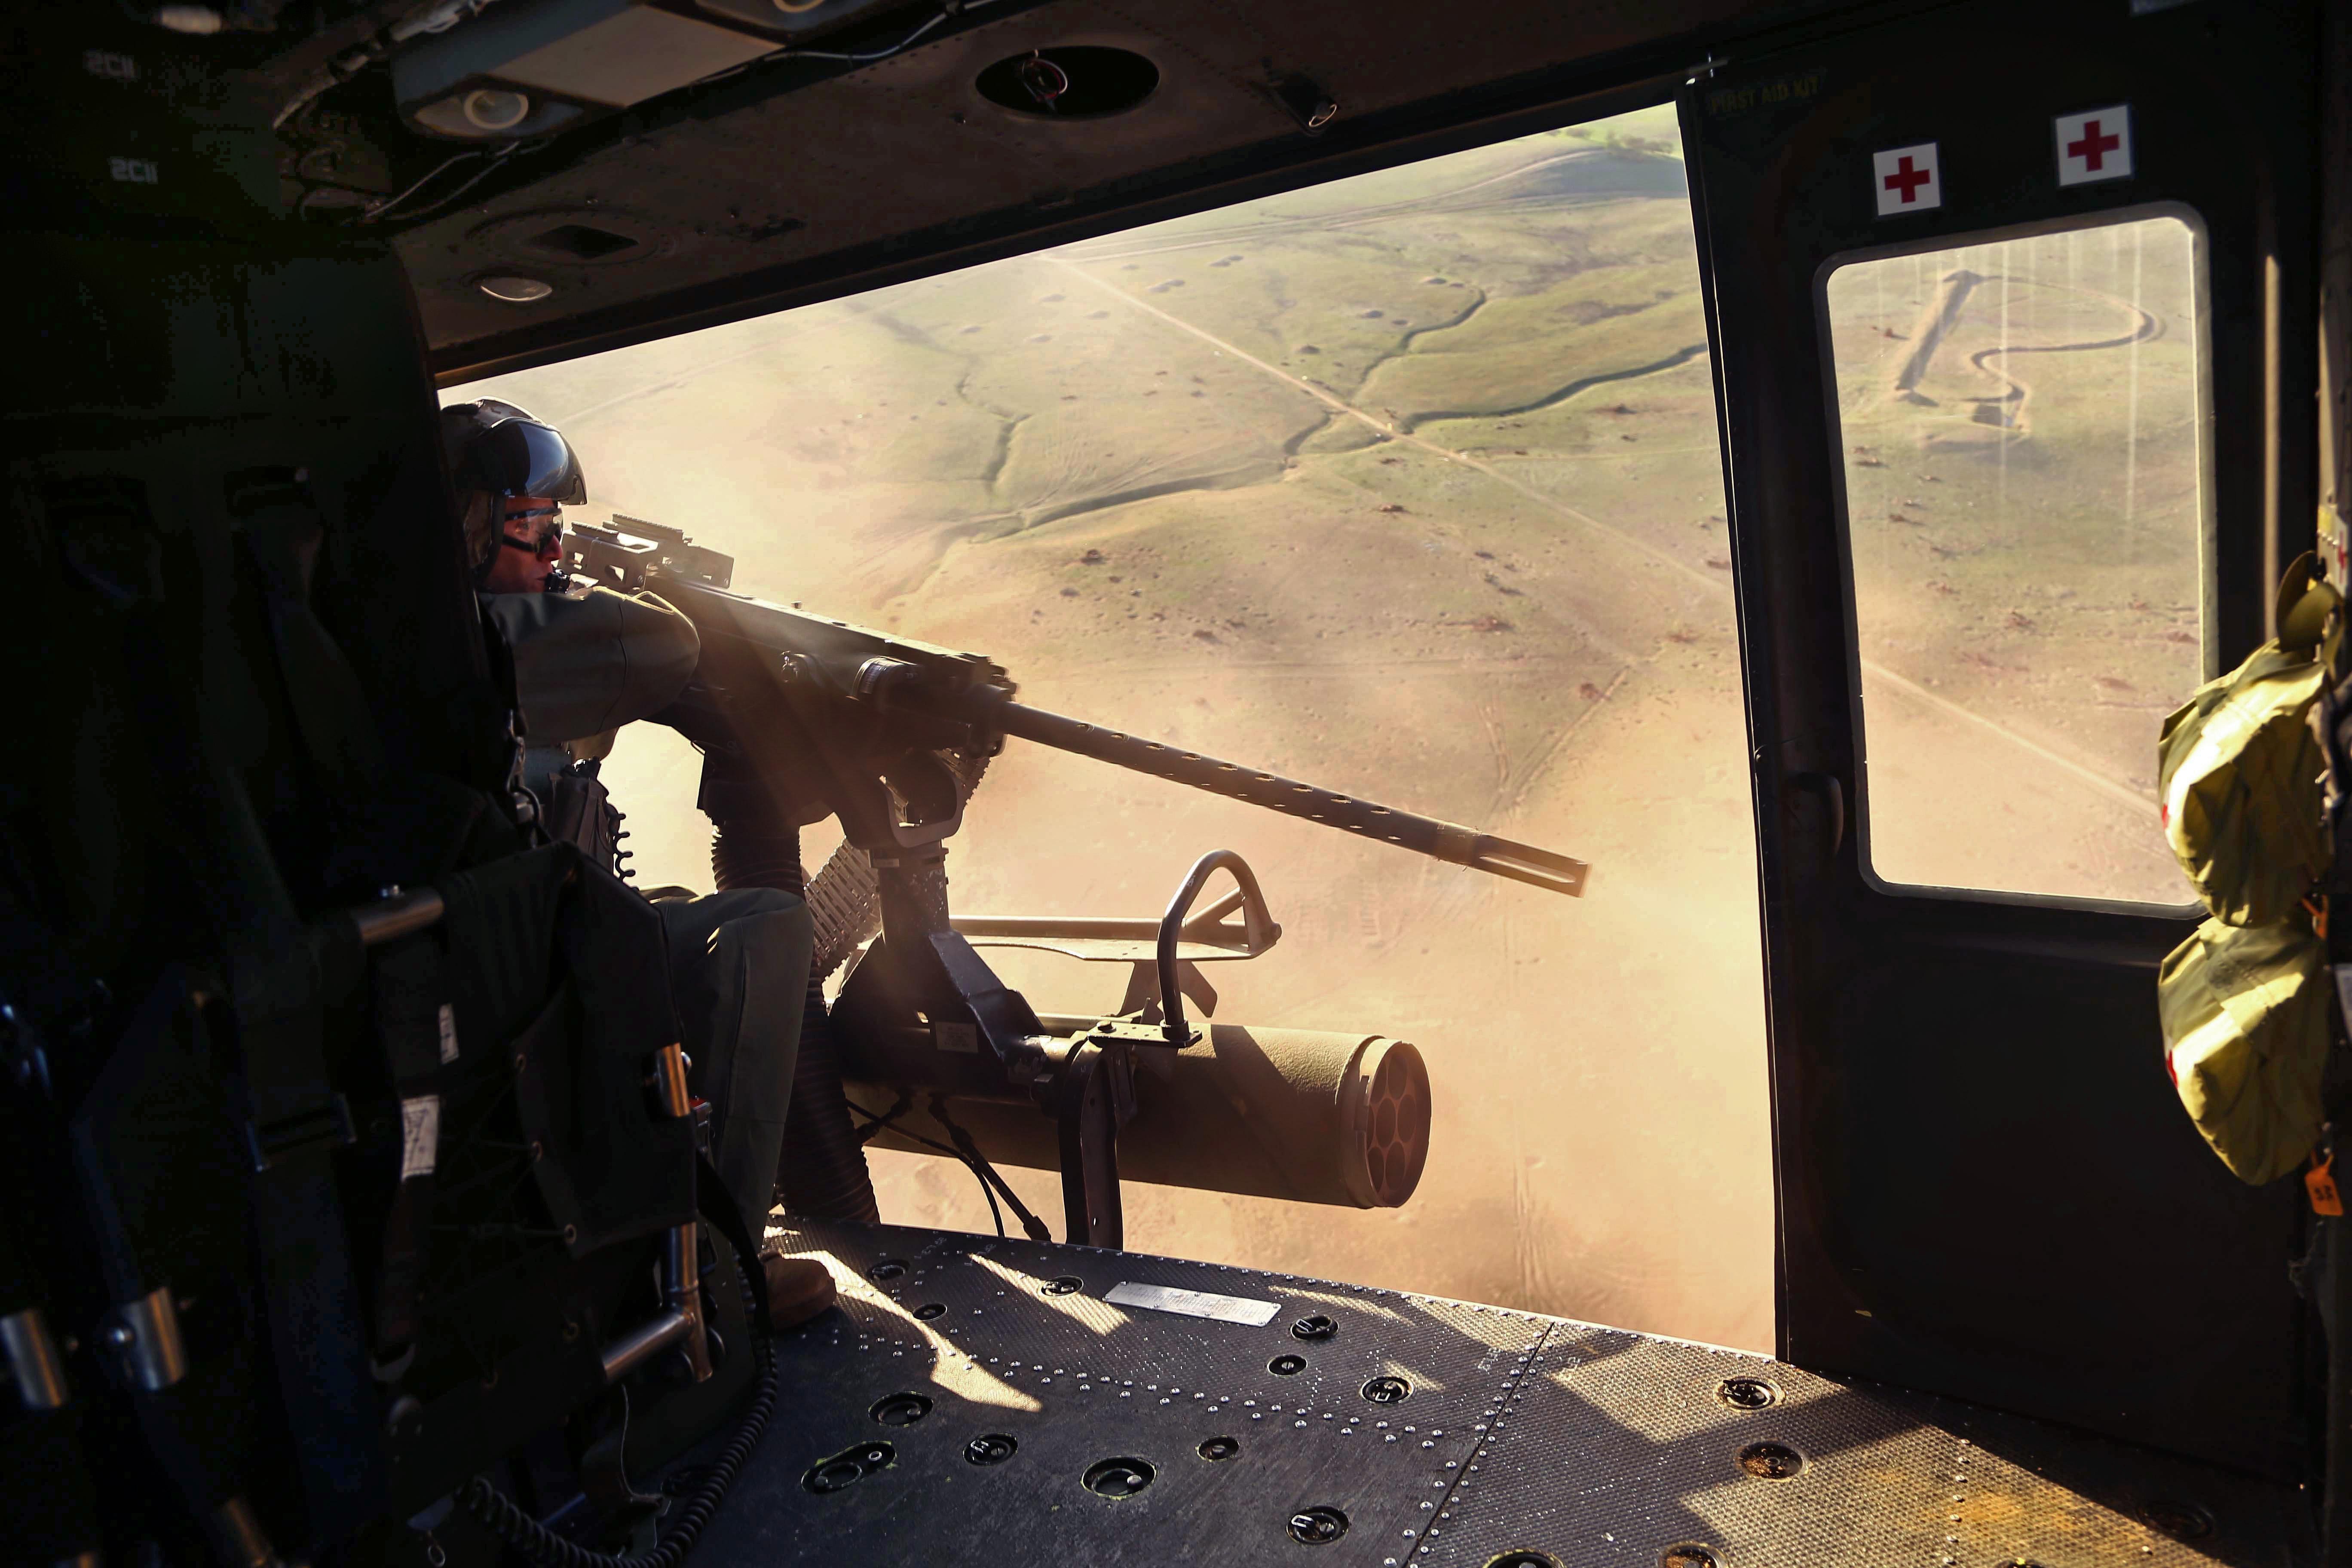 Marine Corps Gunnery Sgt  Kenneth T  Deal fires a GAU-21  50-caliber